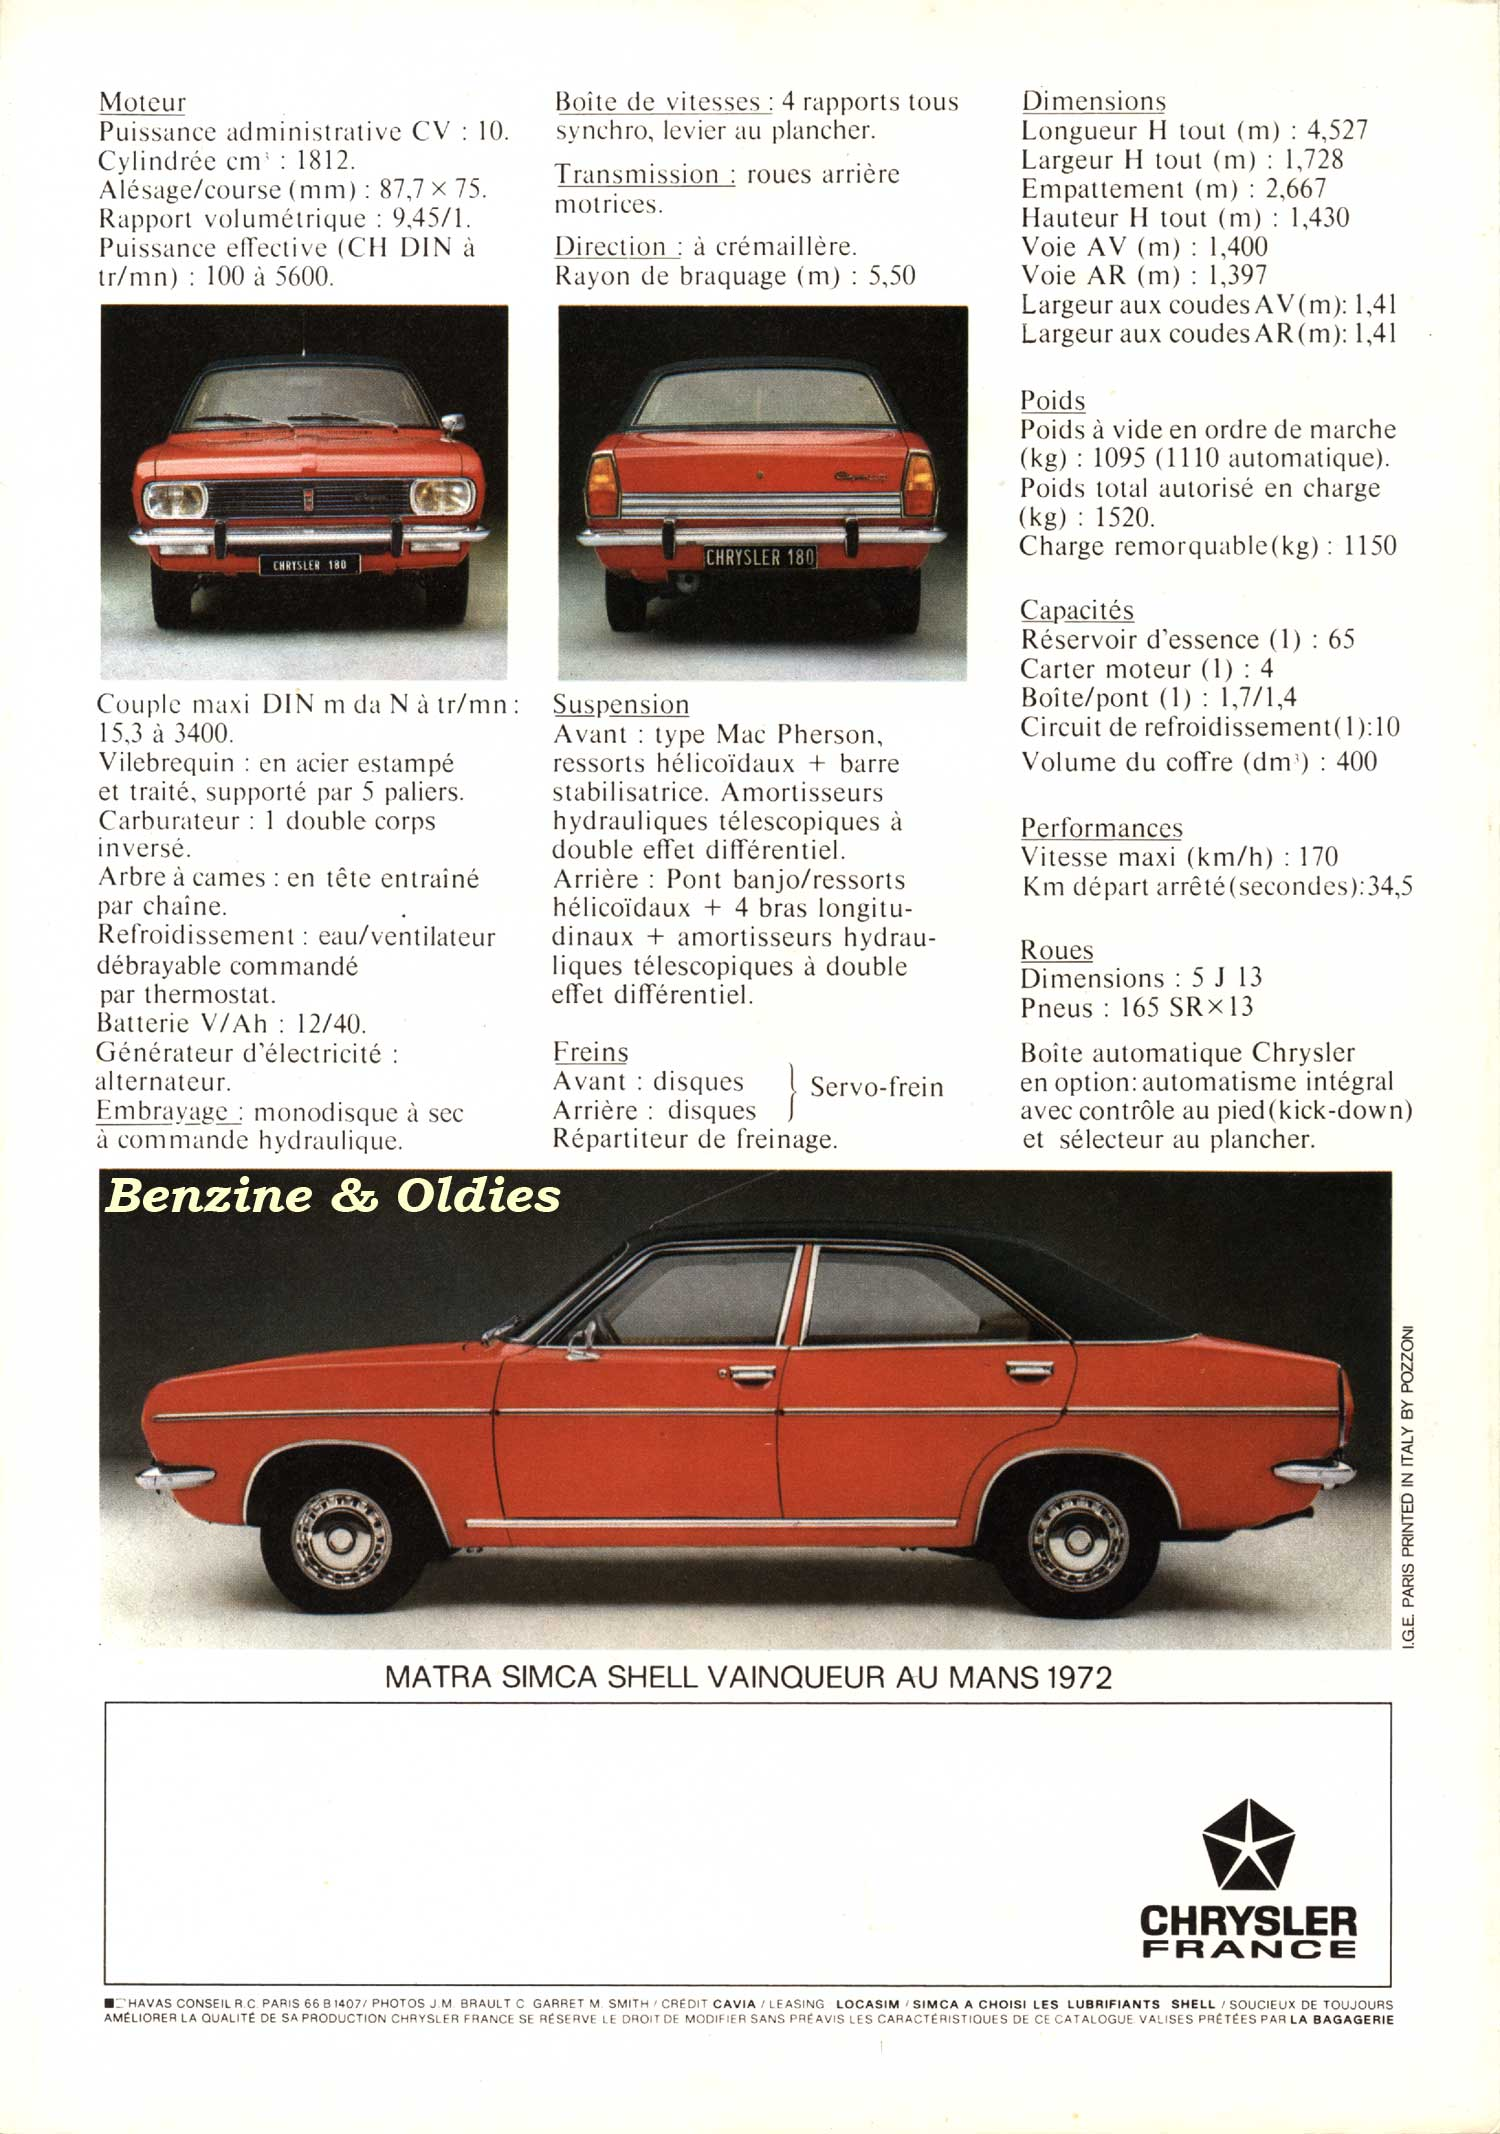 Chrysler 180 : catalogue 01 Chrysler_180_catalogue_01_p6_w1500